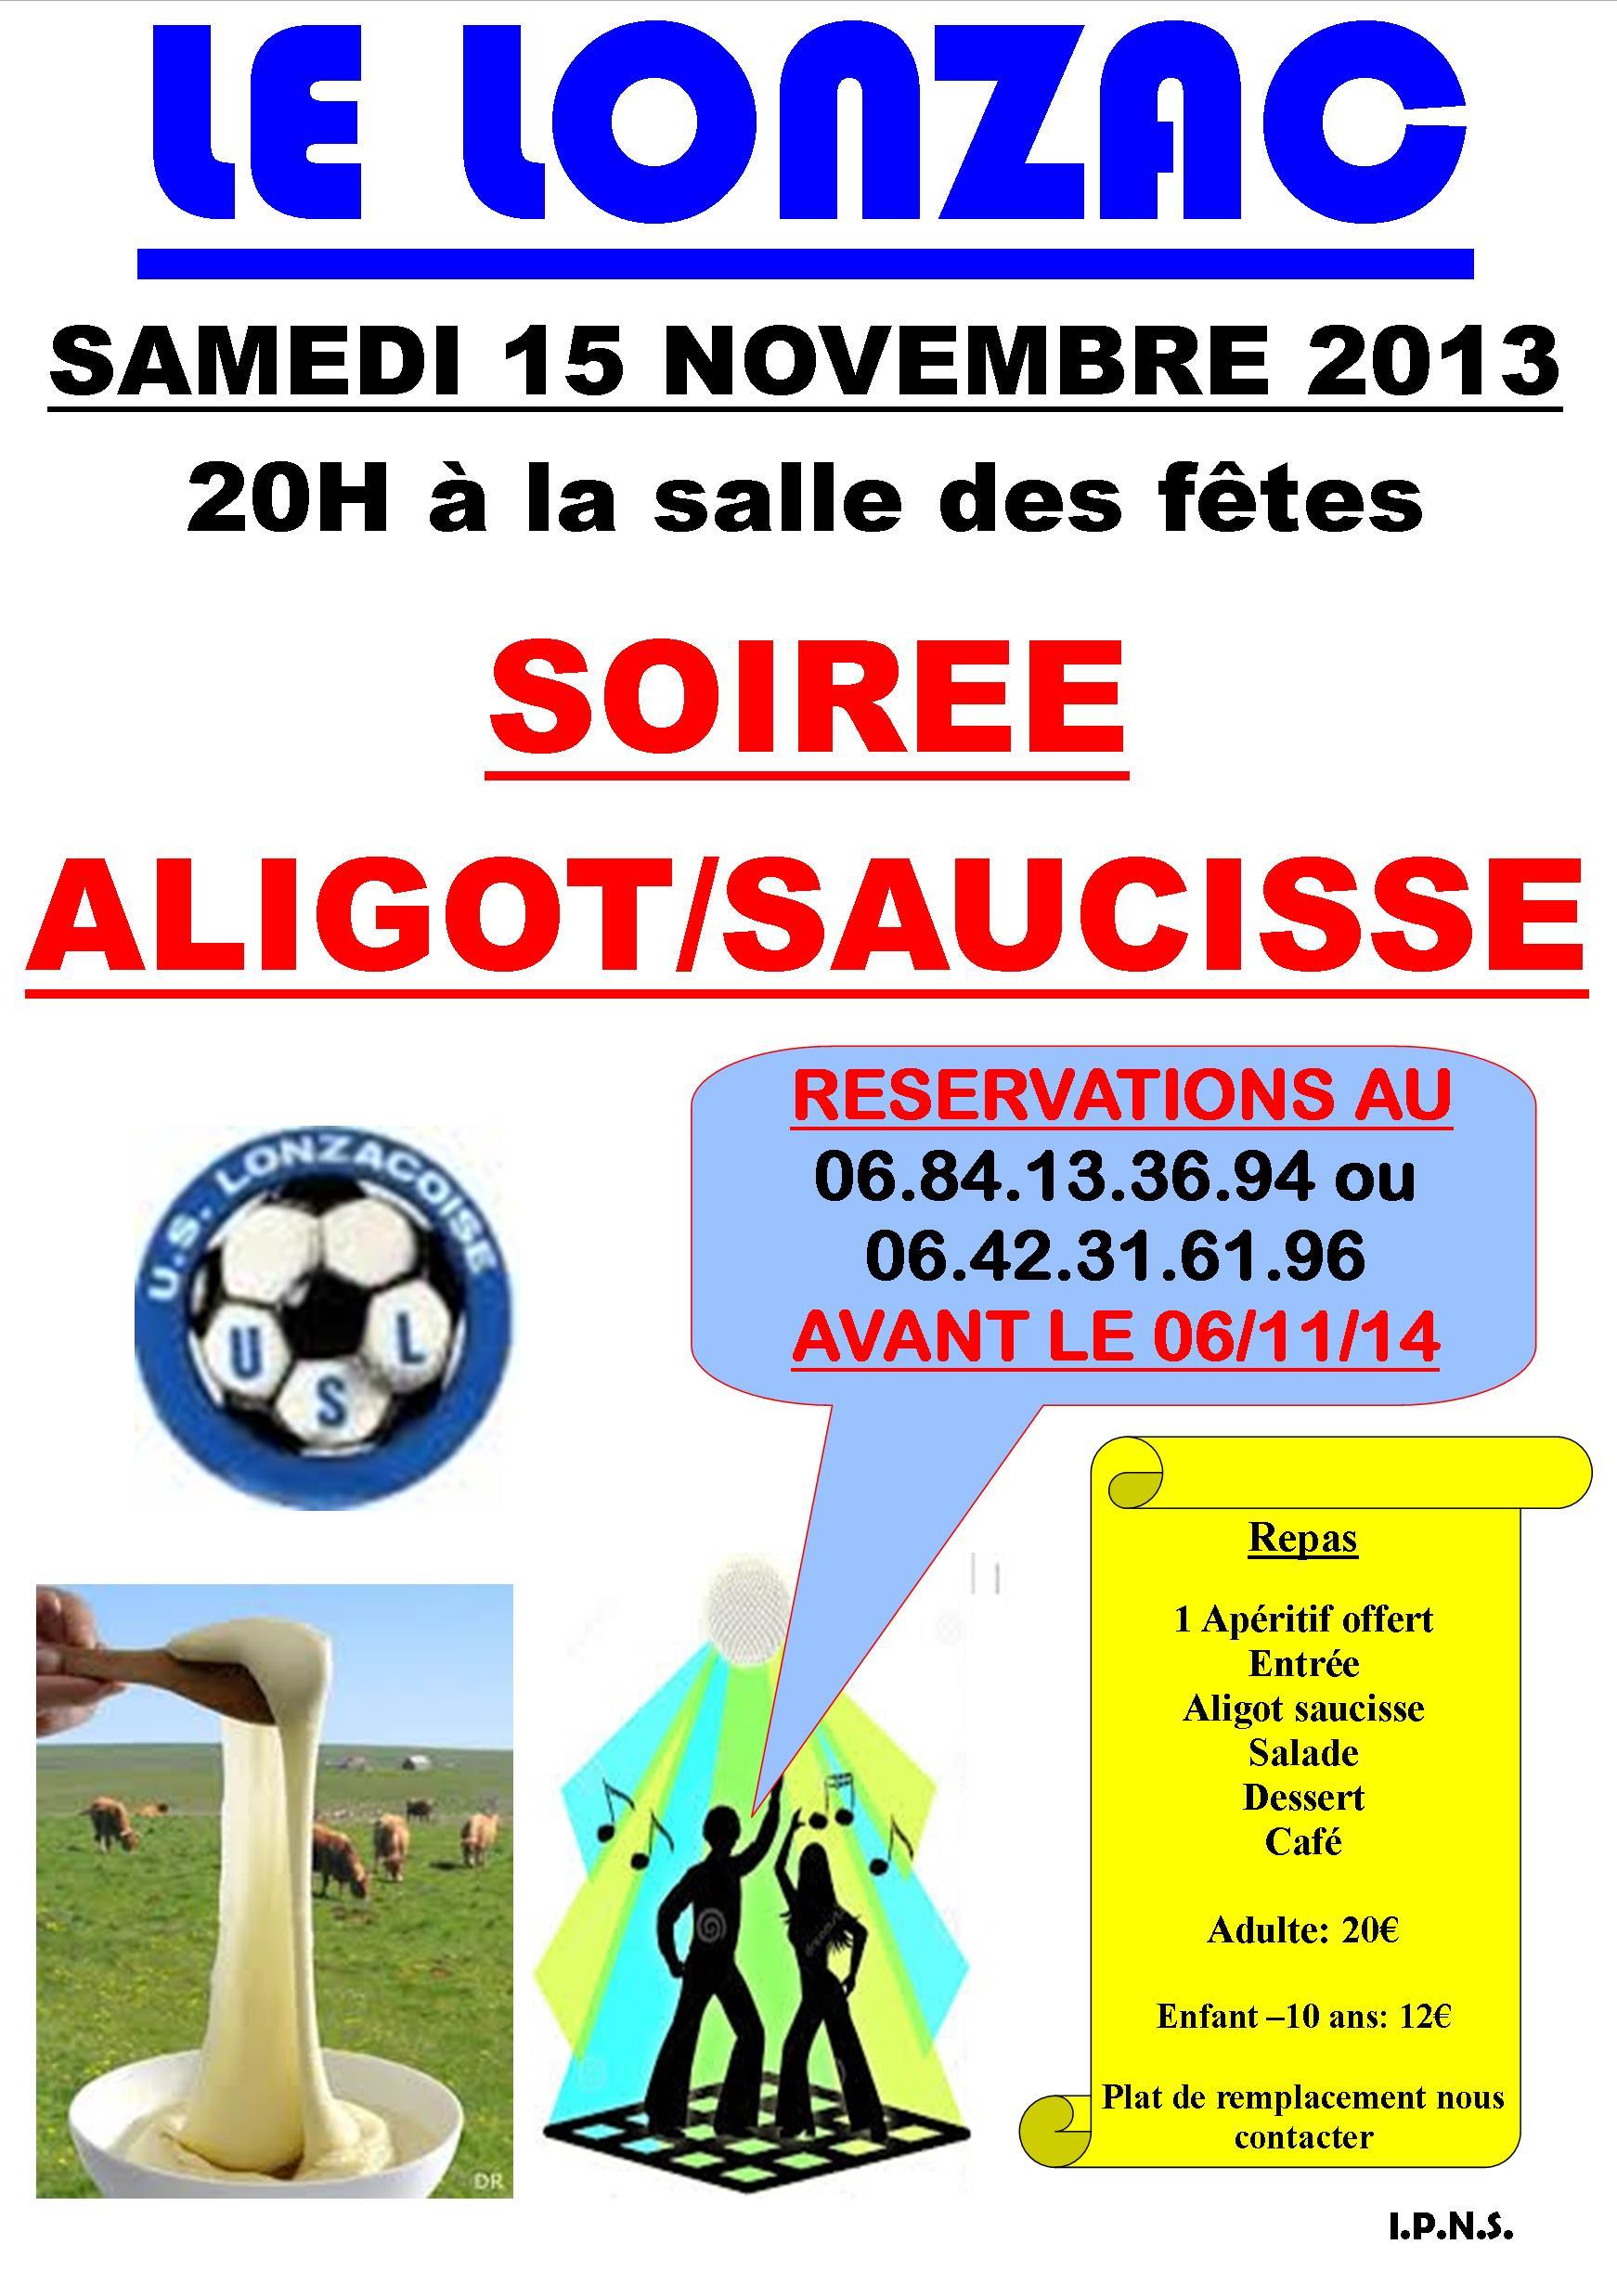 SOIREE ALIGOT SAUCISSE